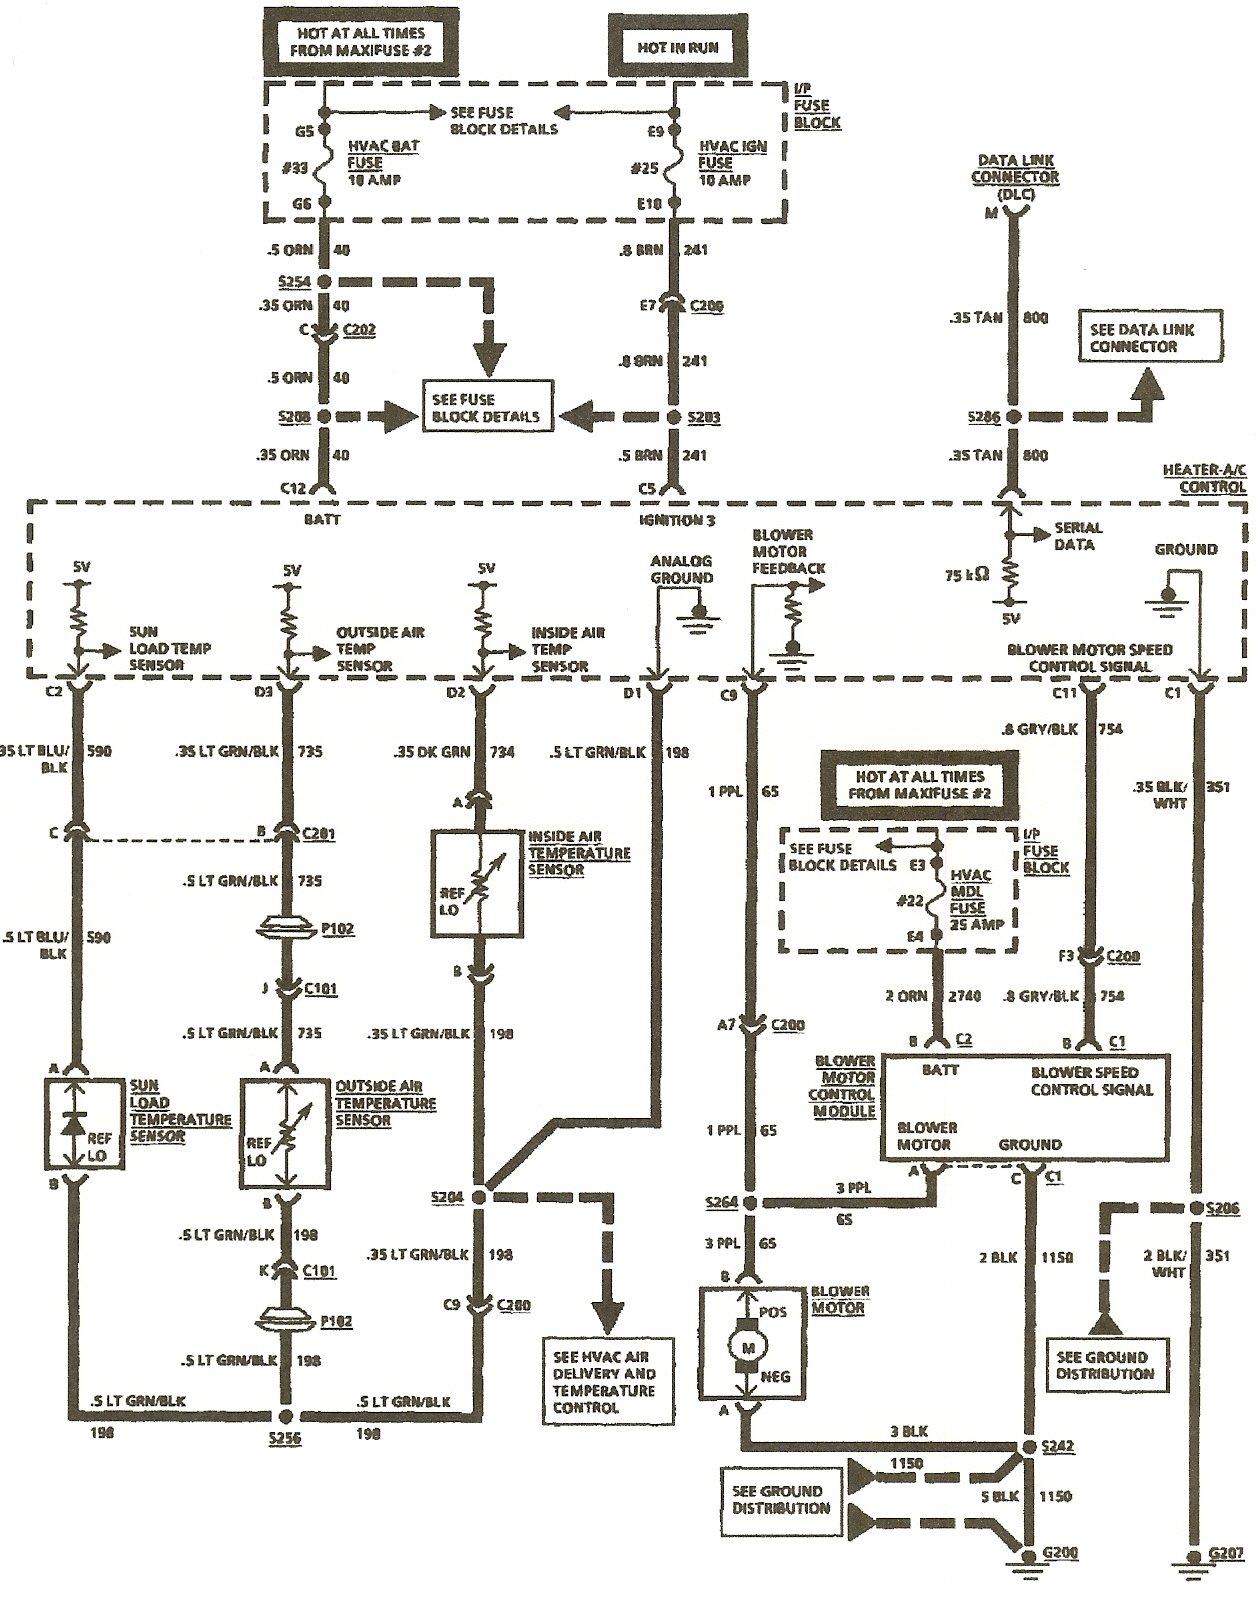 Fleetwood Wiring Diagram Motorhome : fleetwood, wiring, diagram, motorhome, Diagram, Database, Website